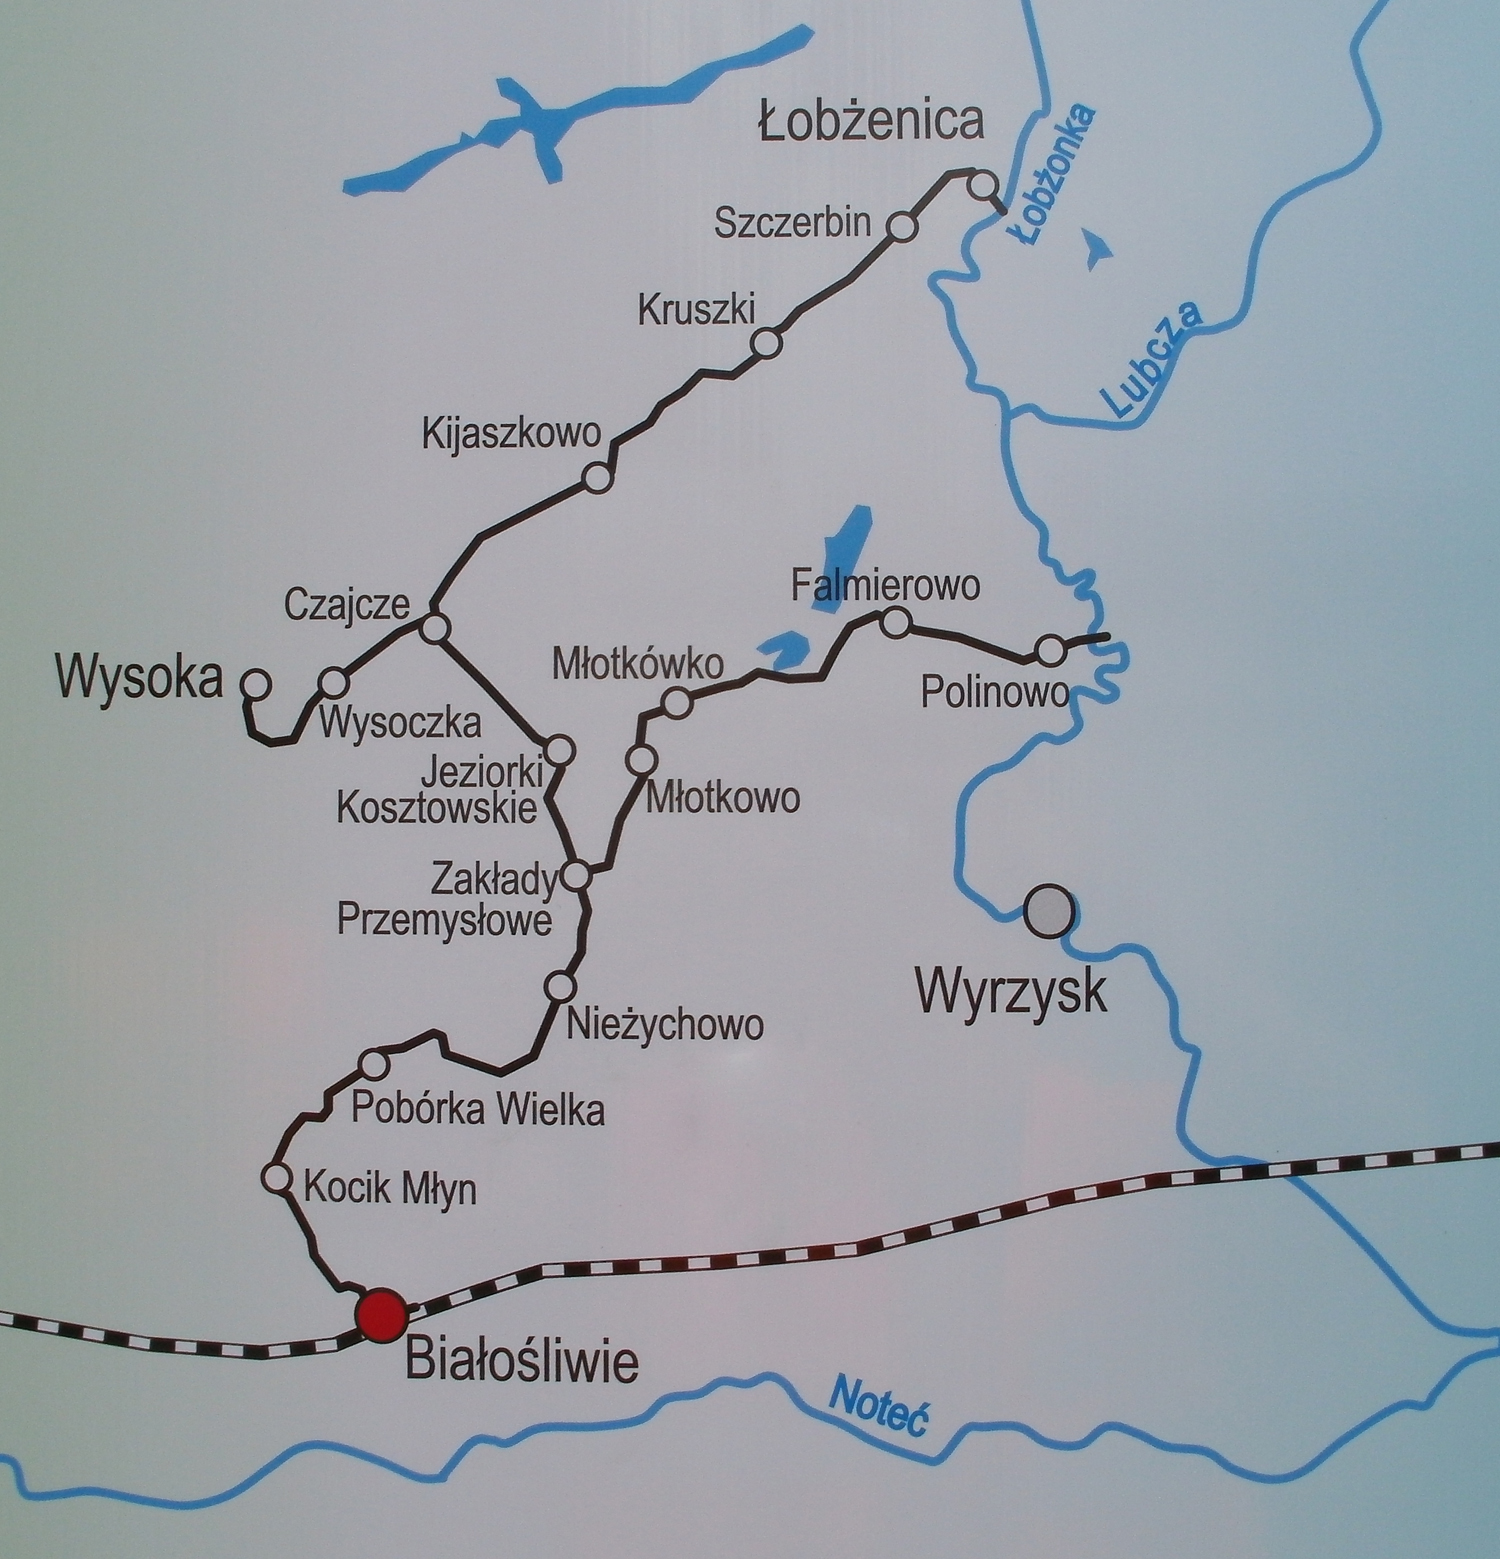 Obecna mapa WKP